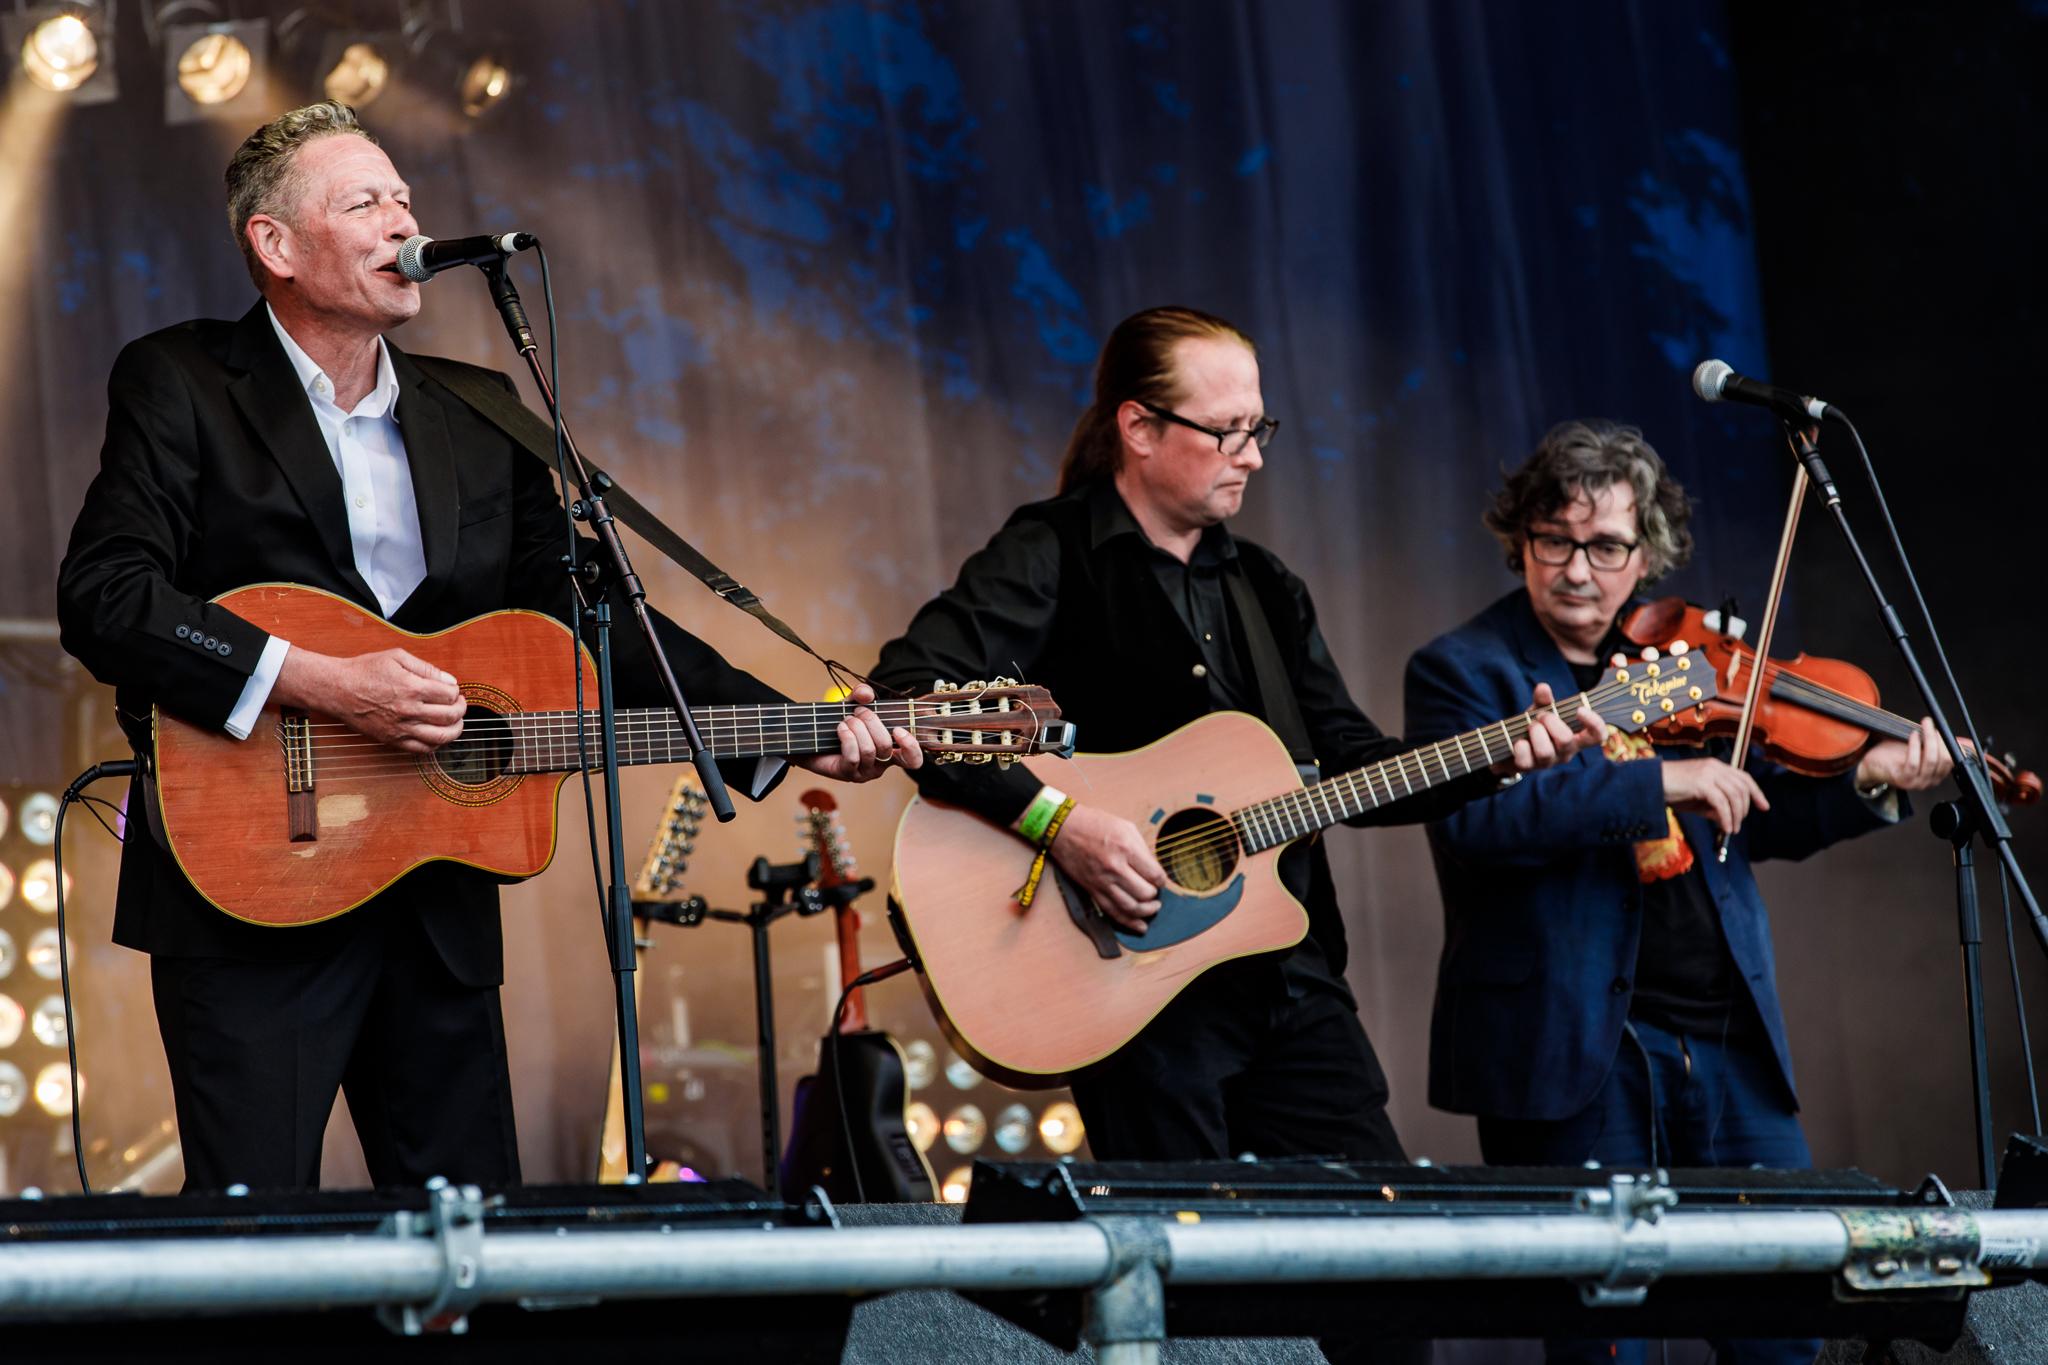 Gerry Colvin at Fairport's Cropredy Convention (photo by Matt Condon / @arcane93)